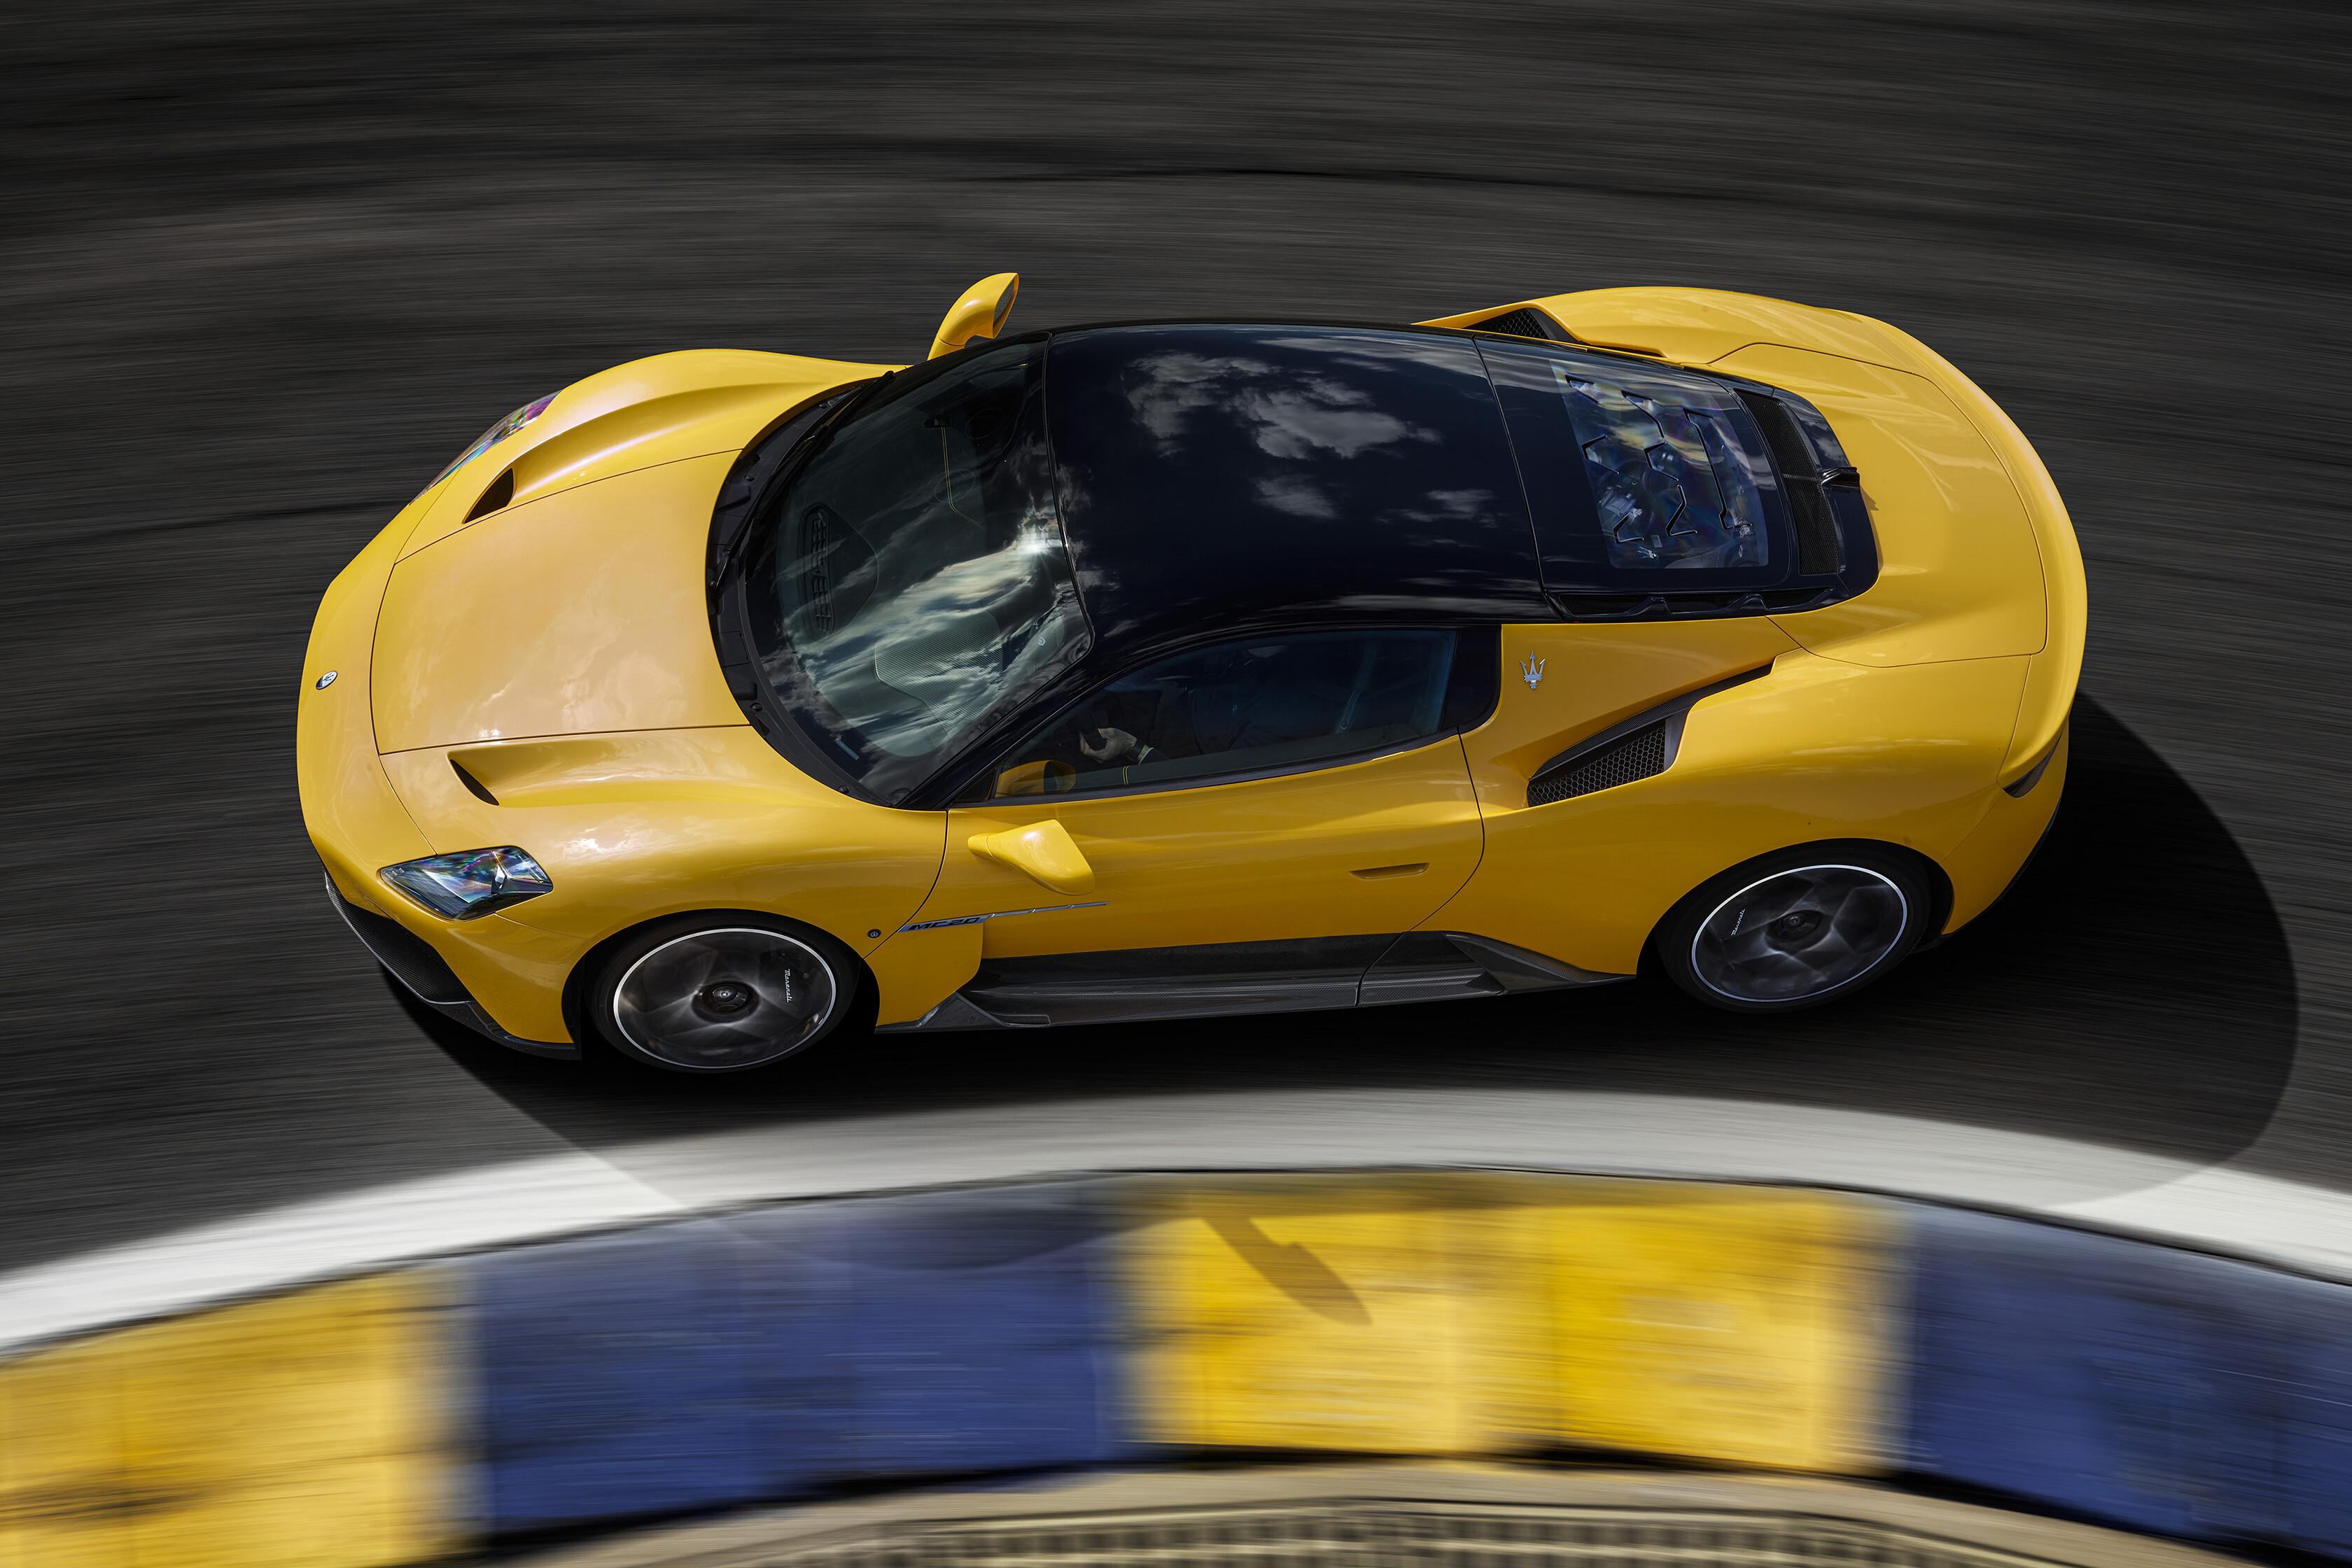 Wheels Reviews 2021 Maserati MC 20 Top Design